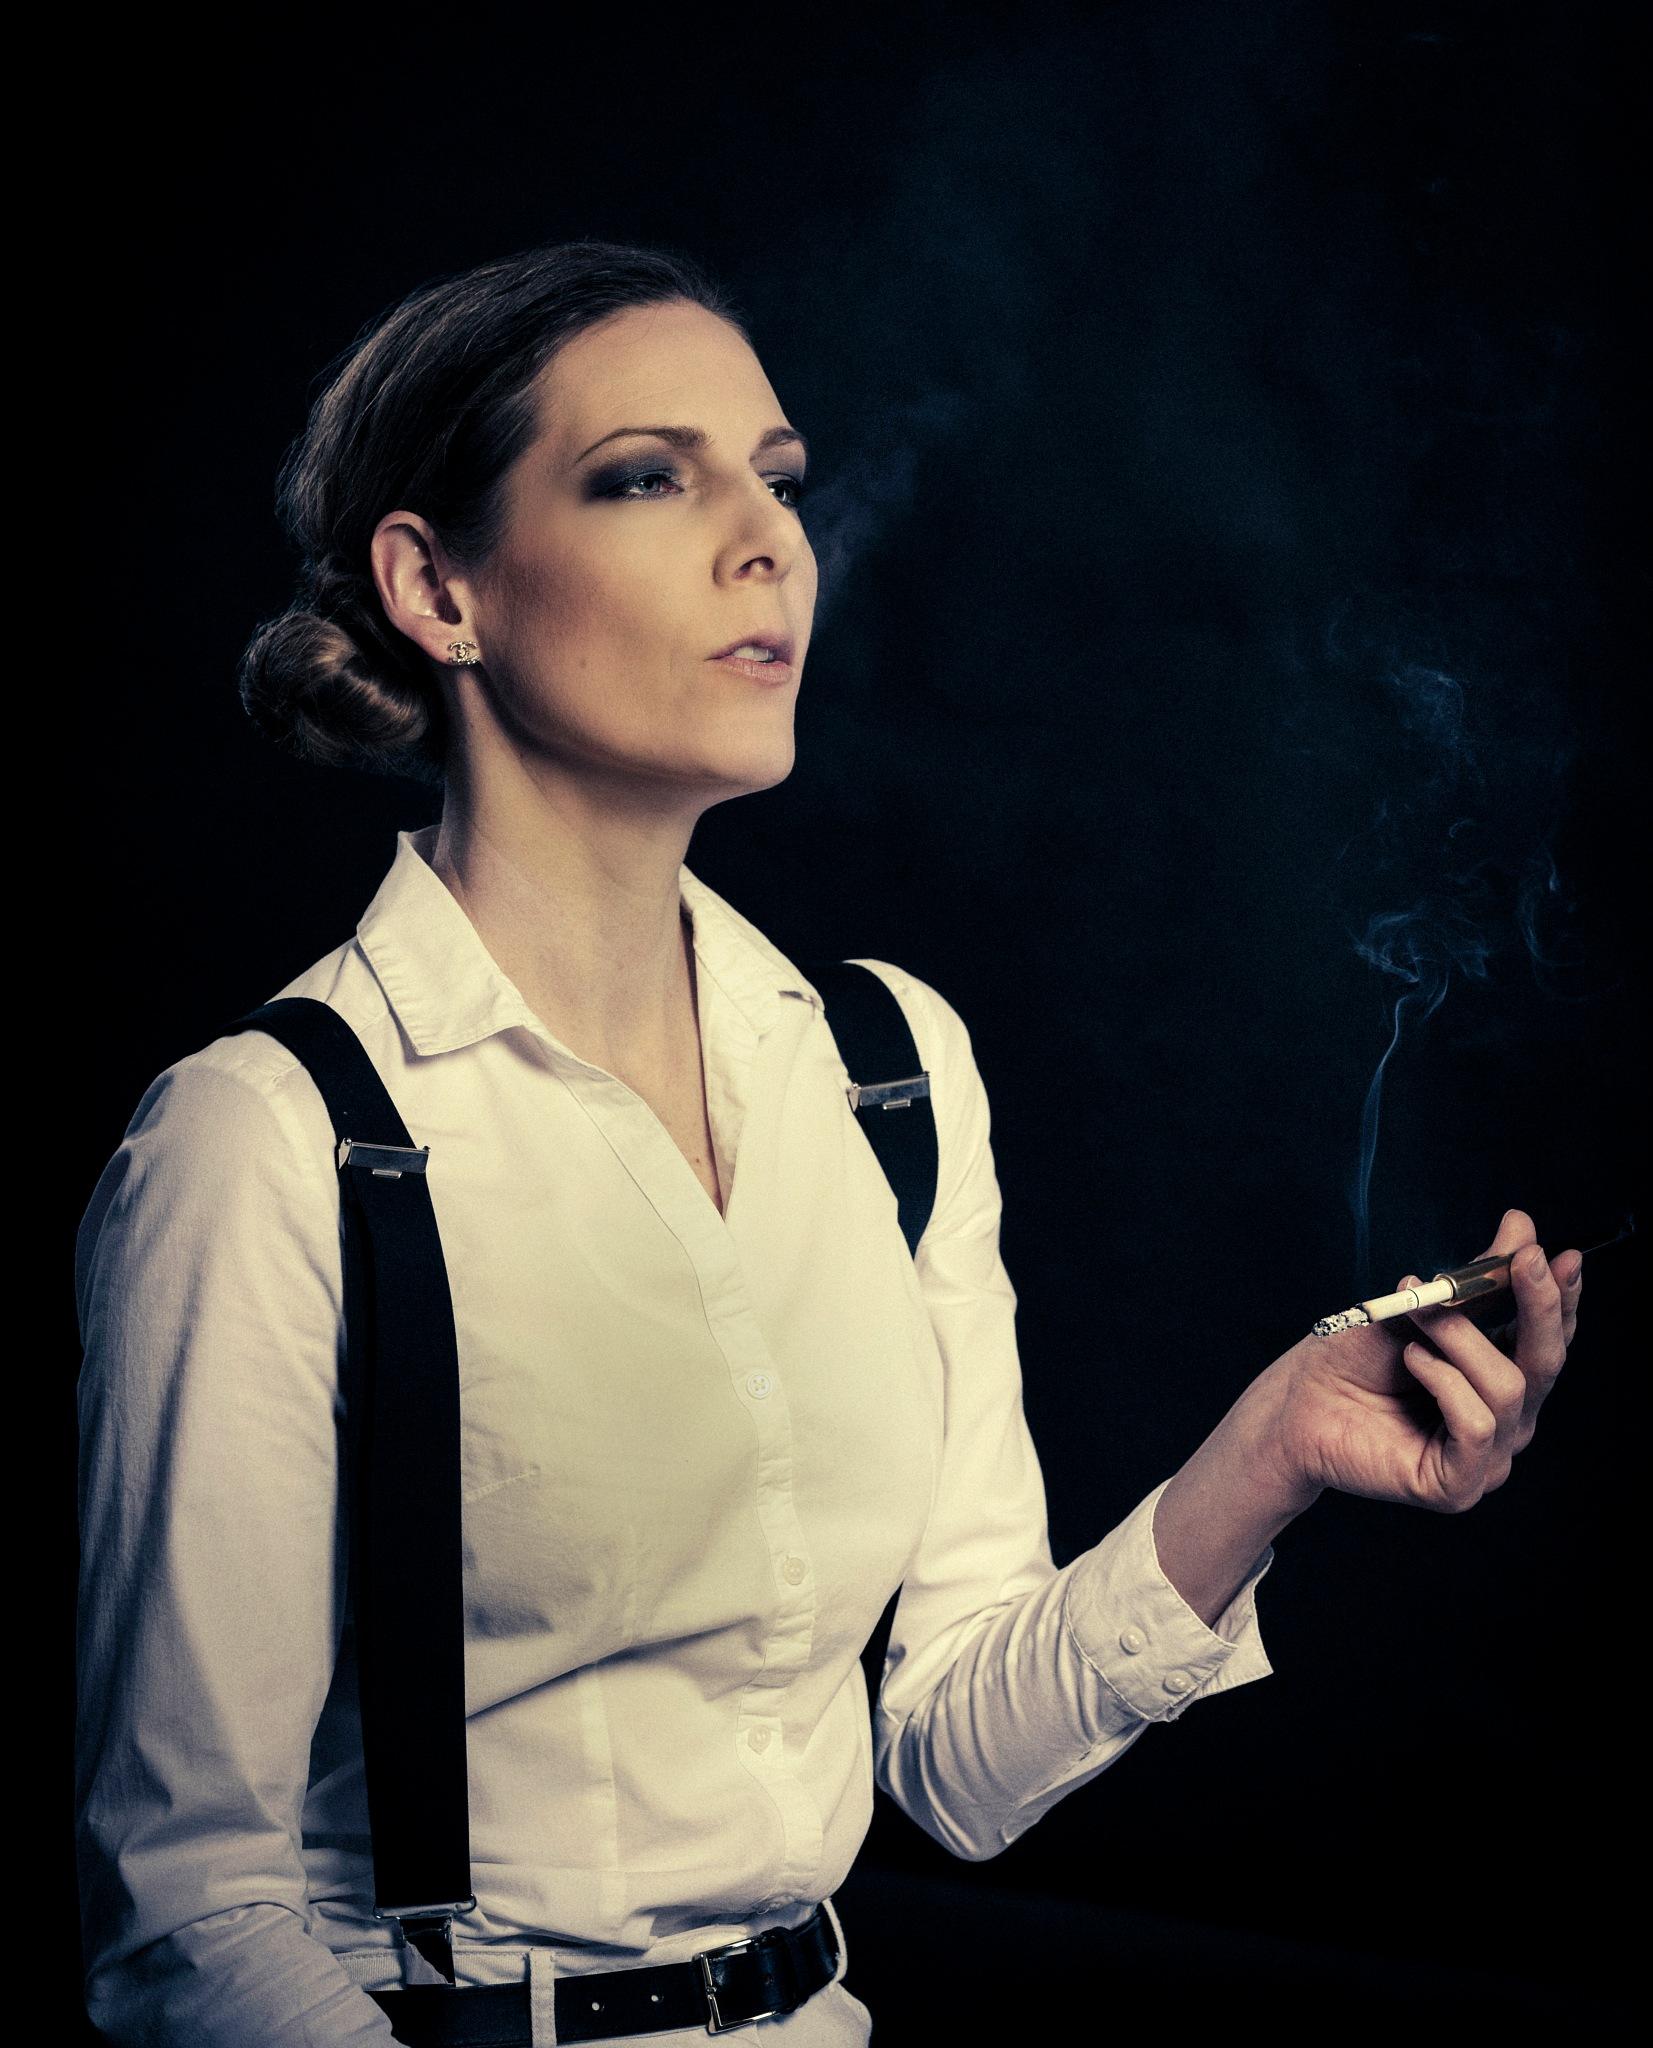 Smoker by Veli-Matti Launio